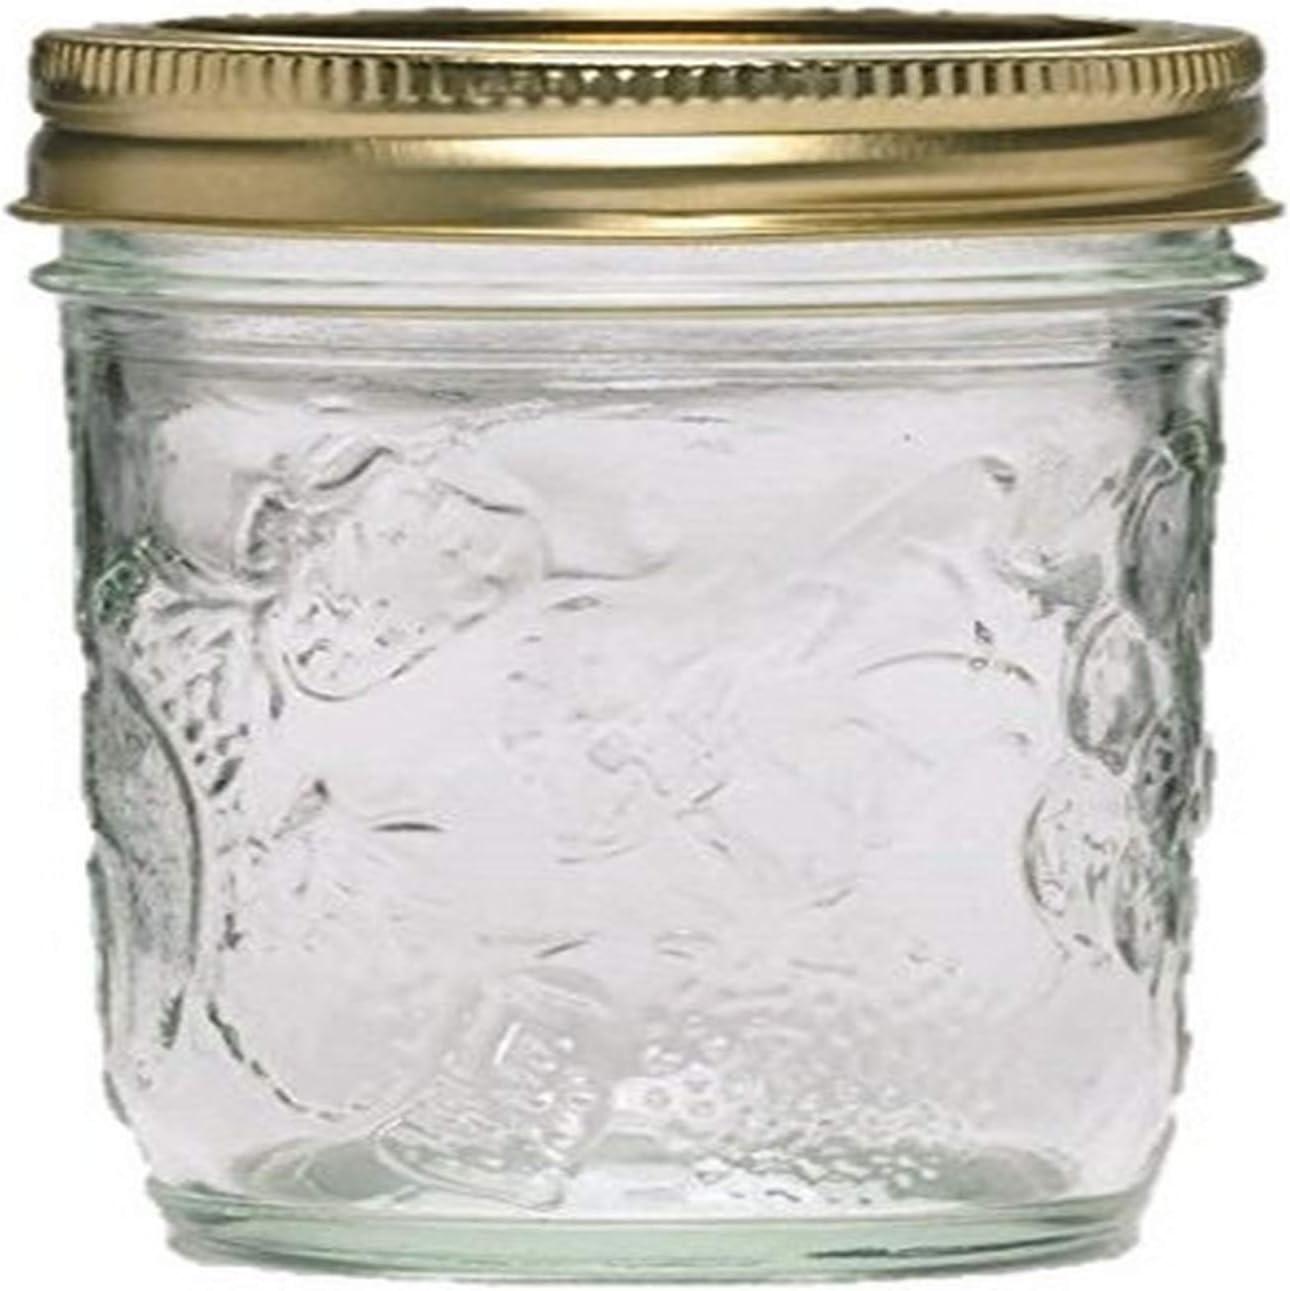 Harvest Mason Regular Mouth 8oz Jelly Jar 12PK